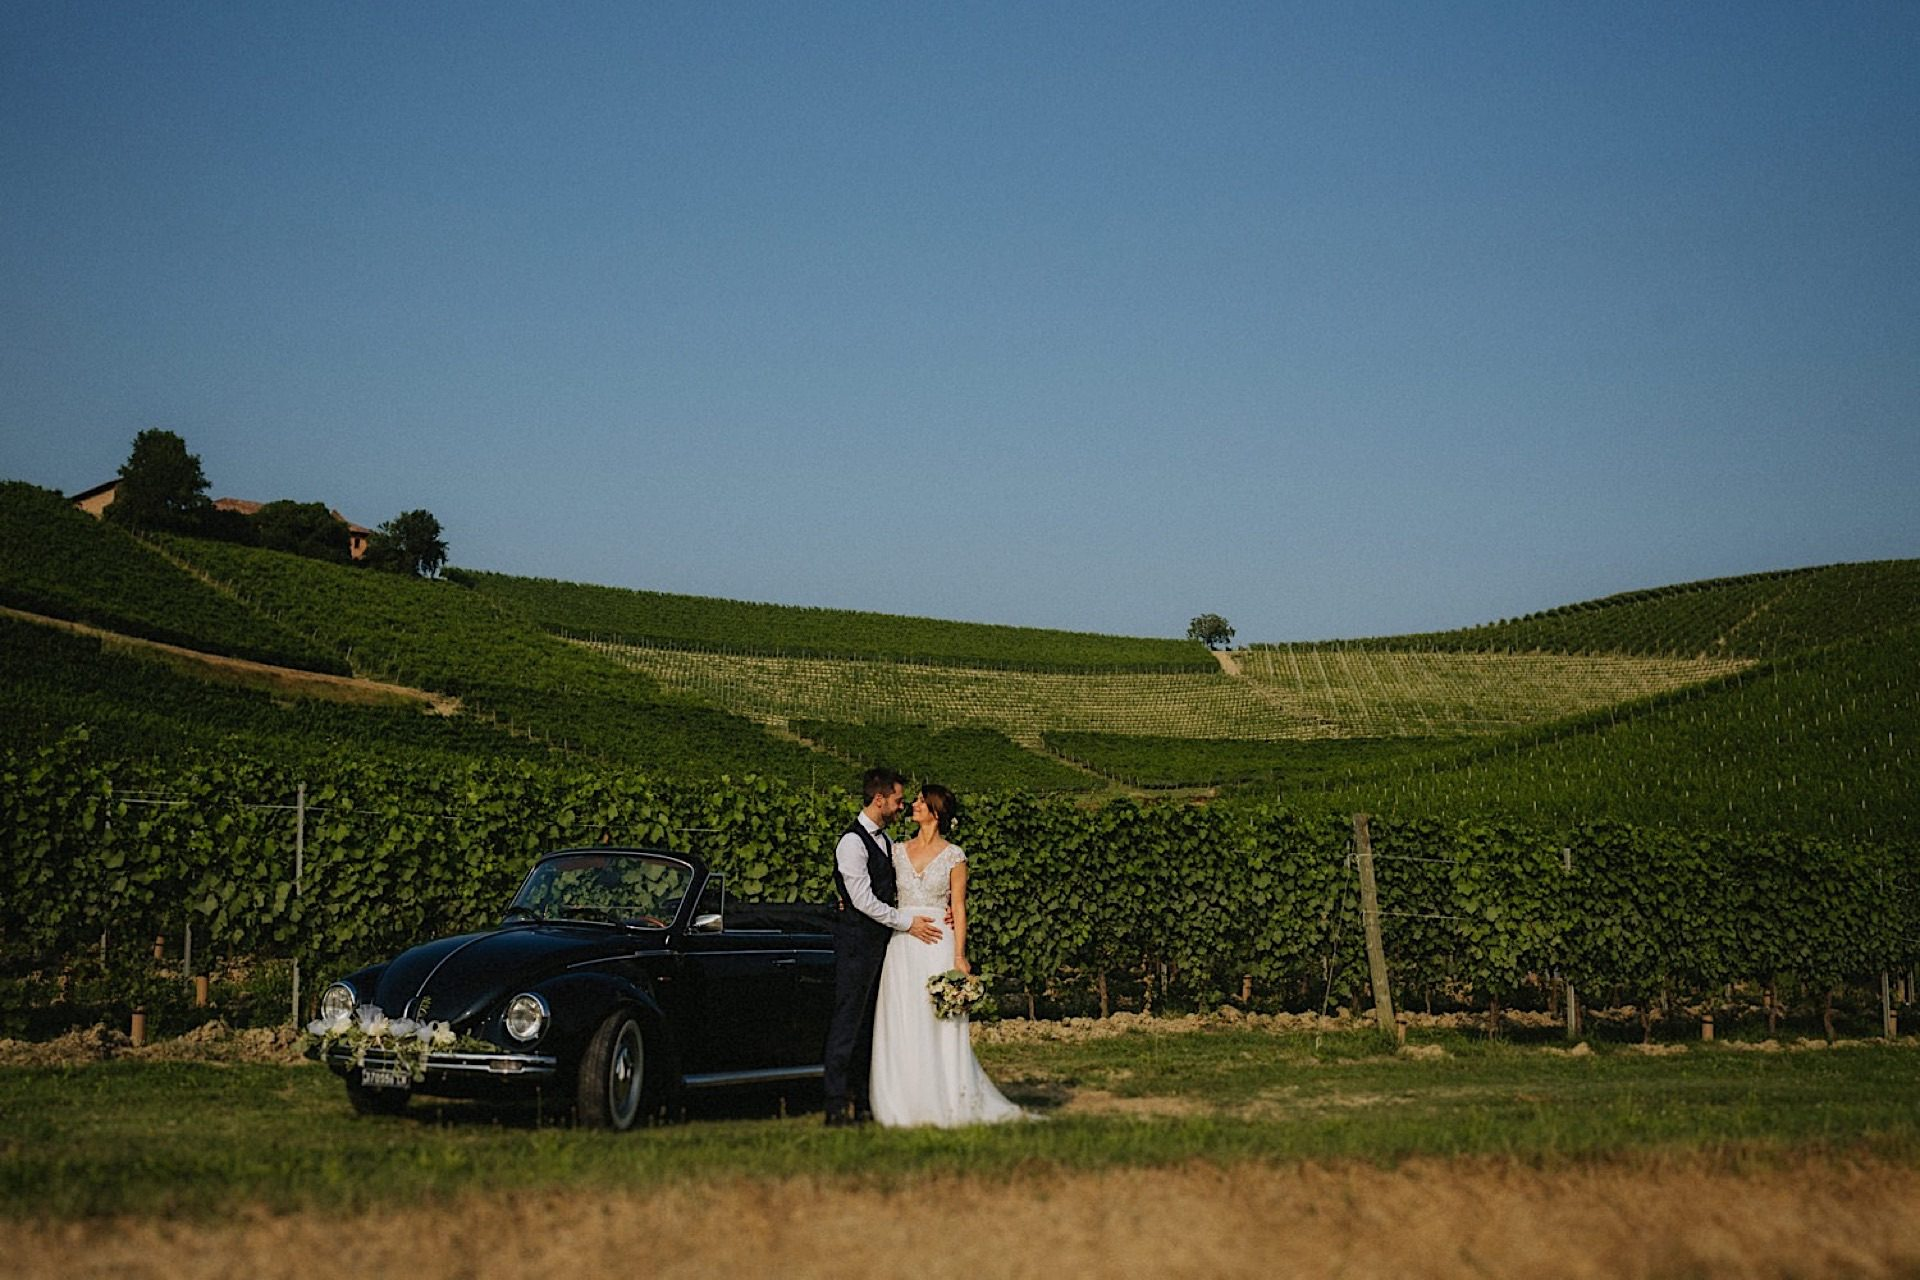 fotografo matrimonio Langhe tenuta fontanafredda